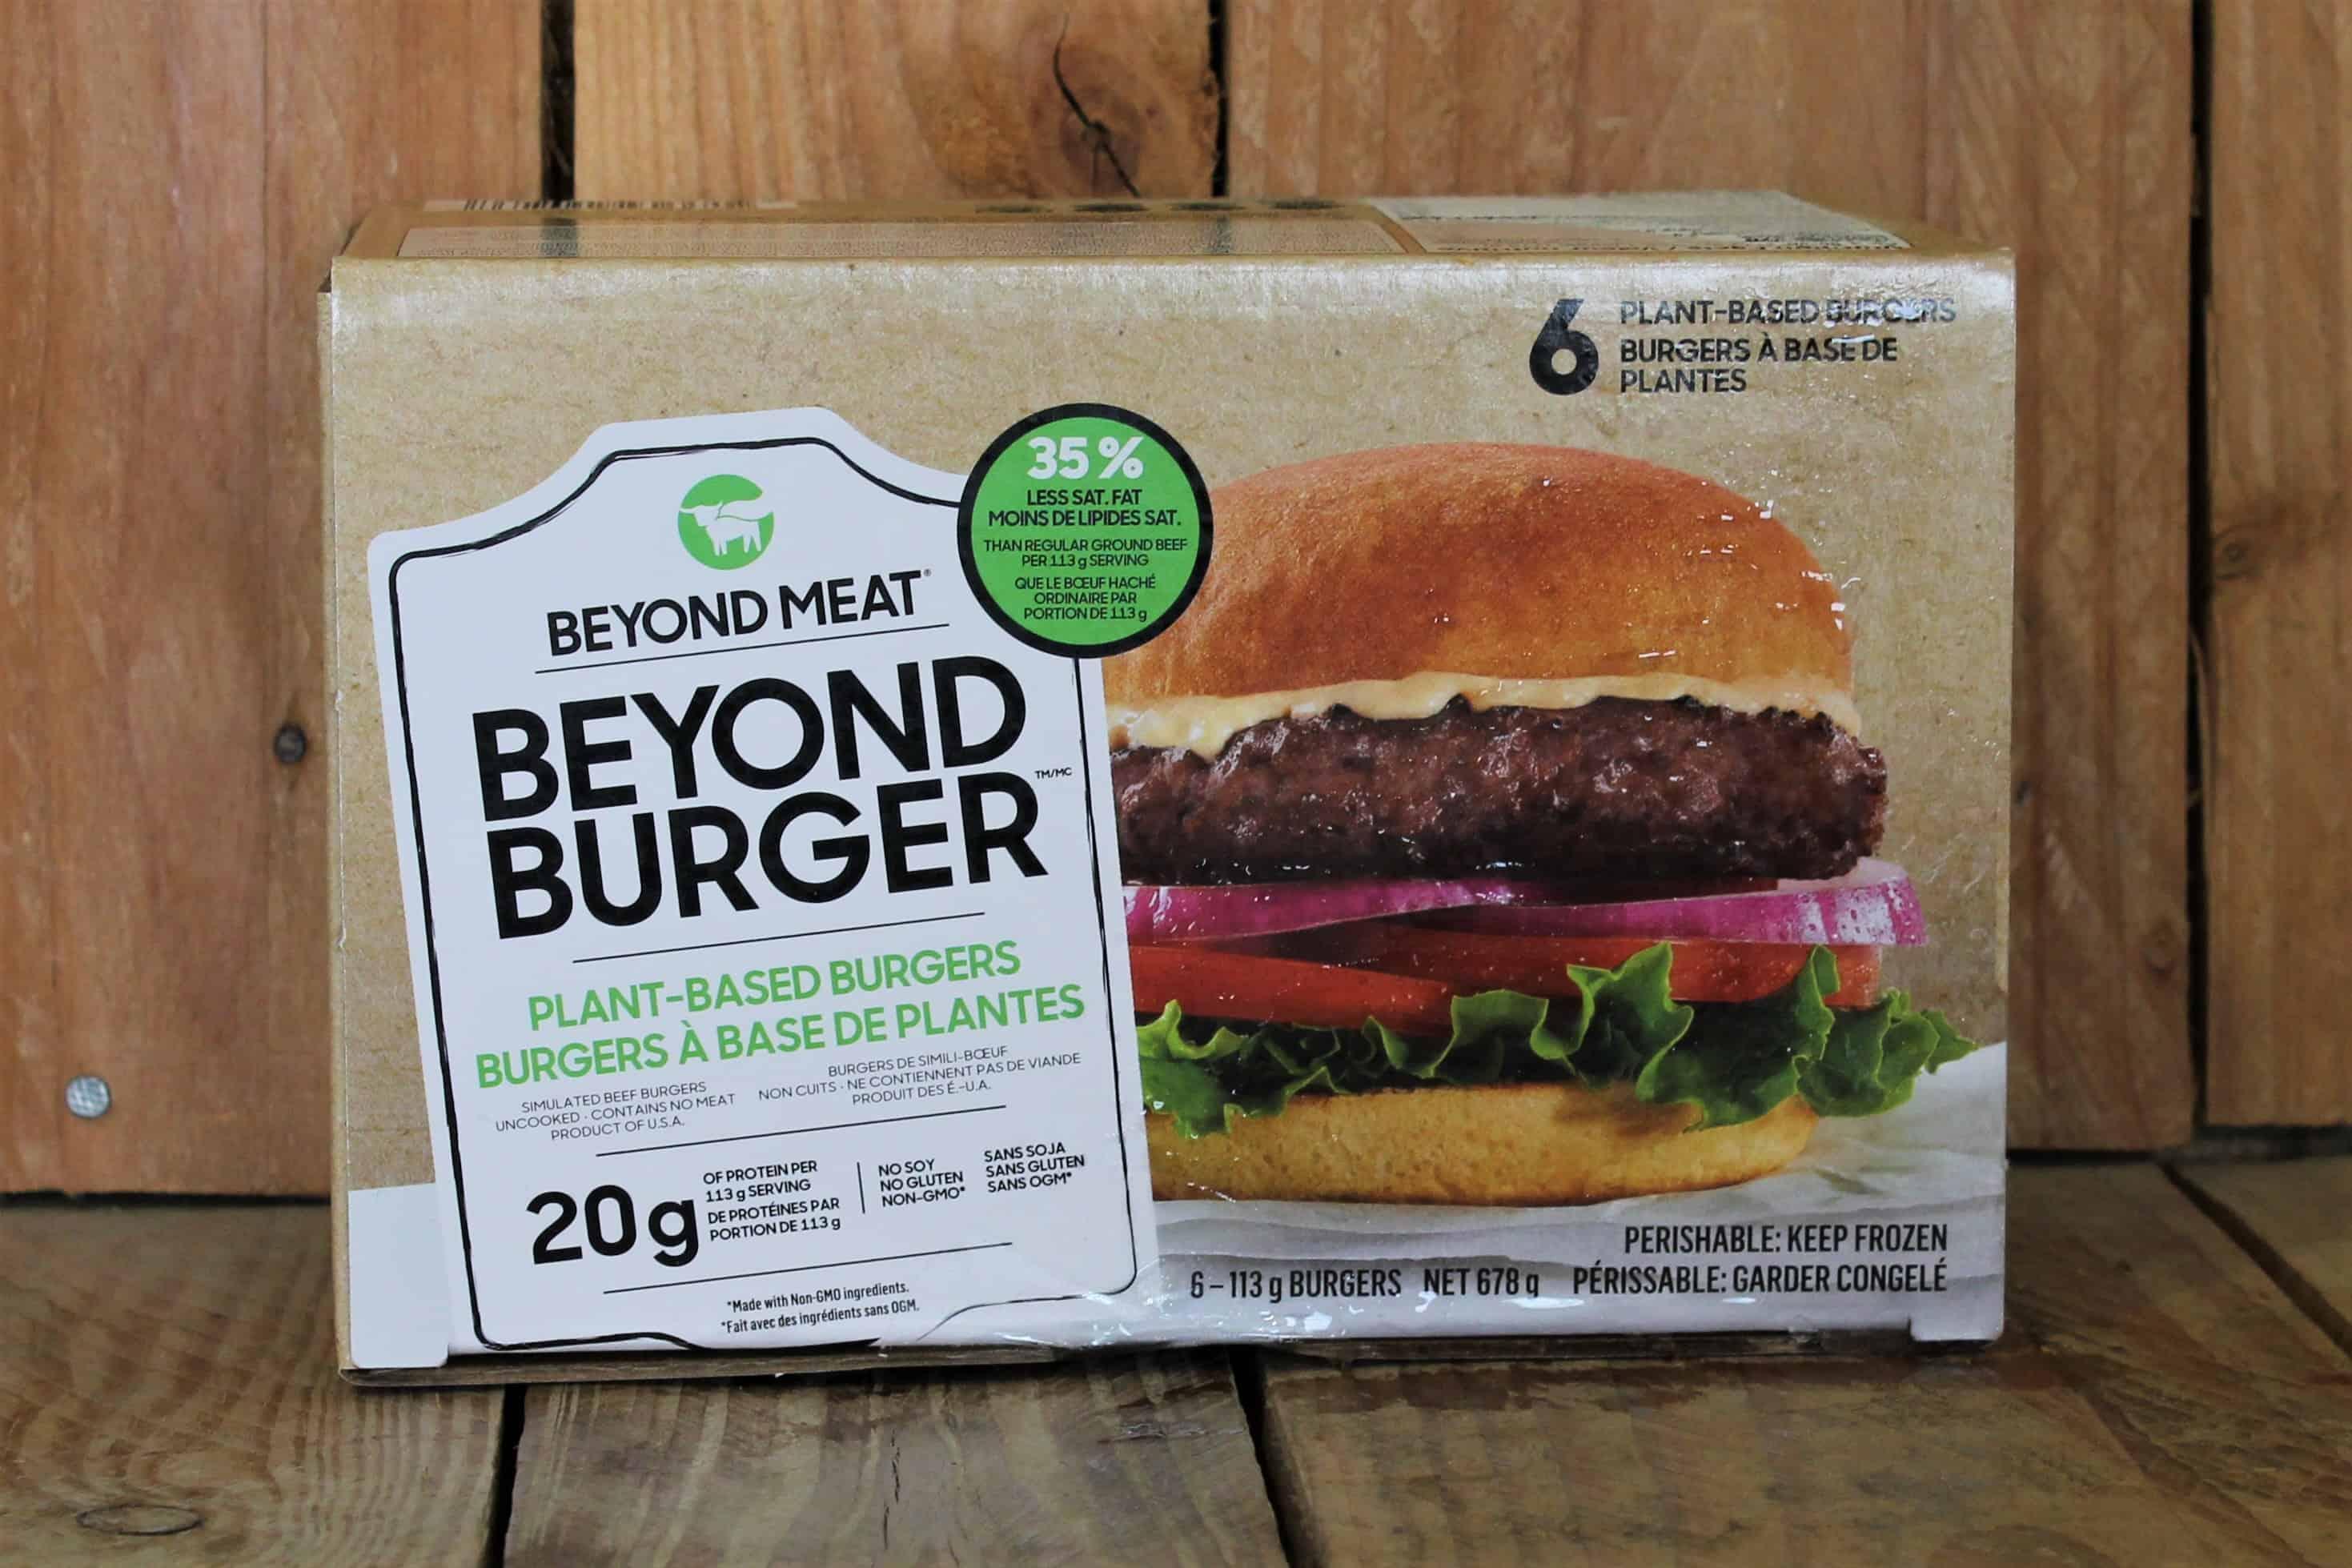 Beyond Meat – Burger, Plant-Based VEGETARIAN (6-Pack/678g)